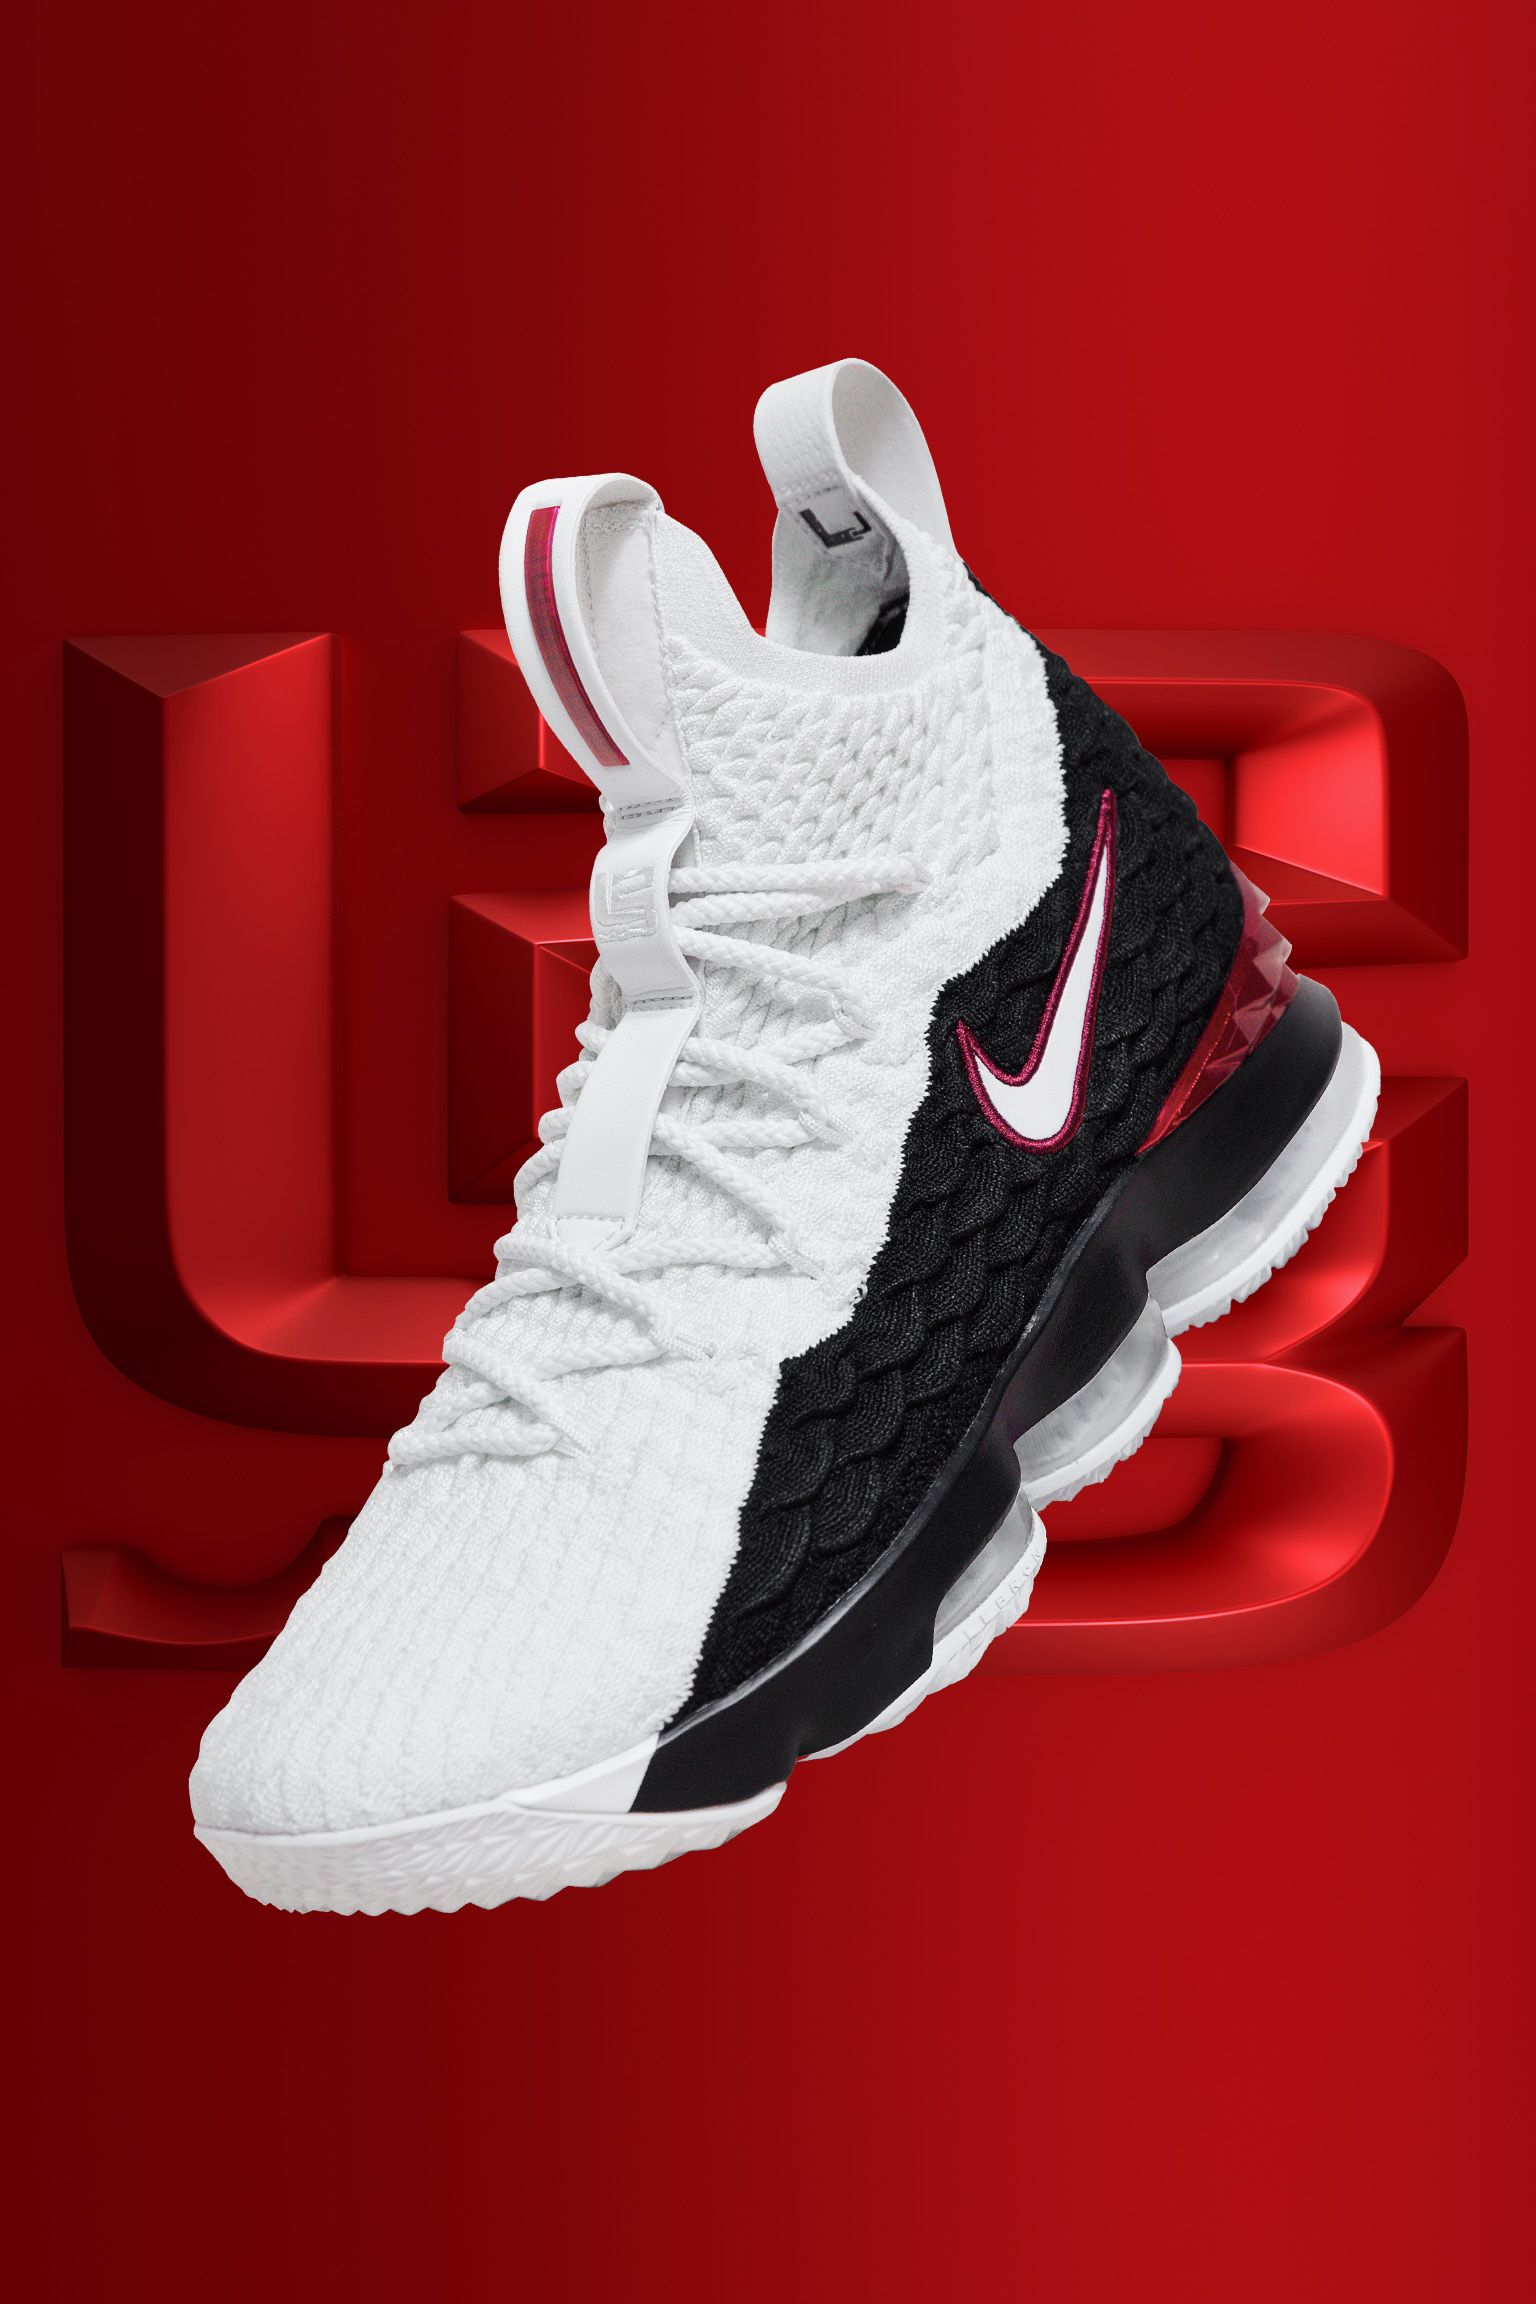 1e9d45a6a3a4 Nike Lebron 15 LeBron Watch Air Zoom Generation ...